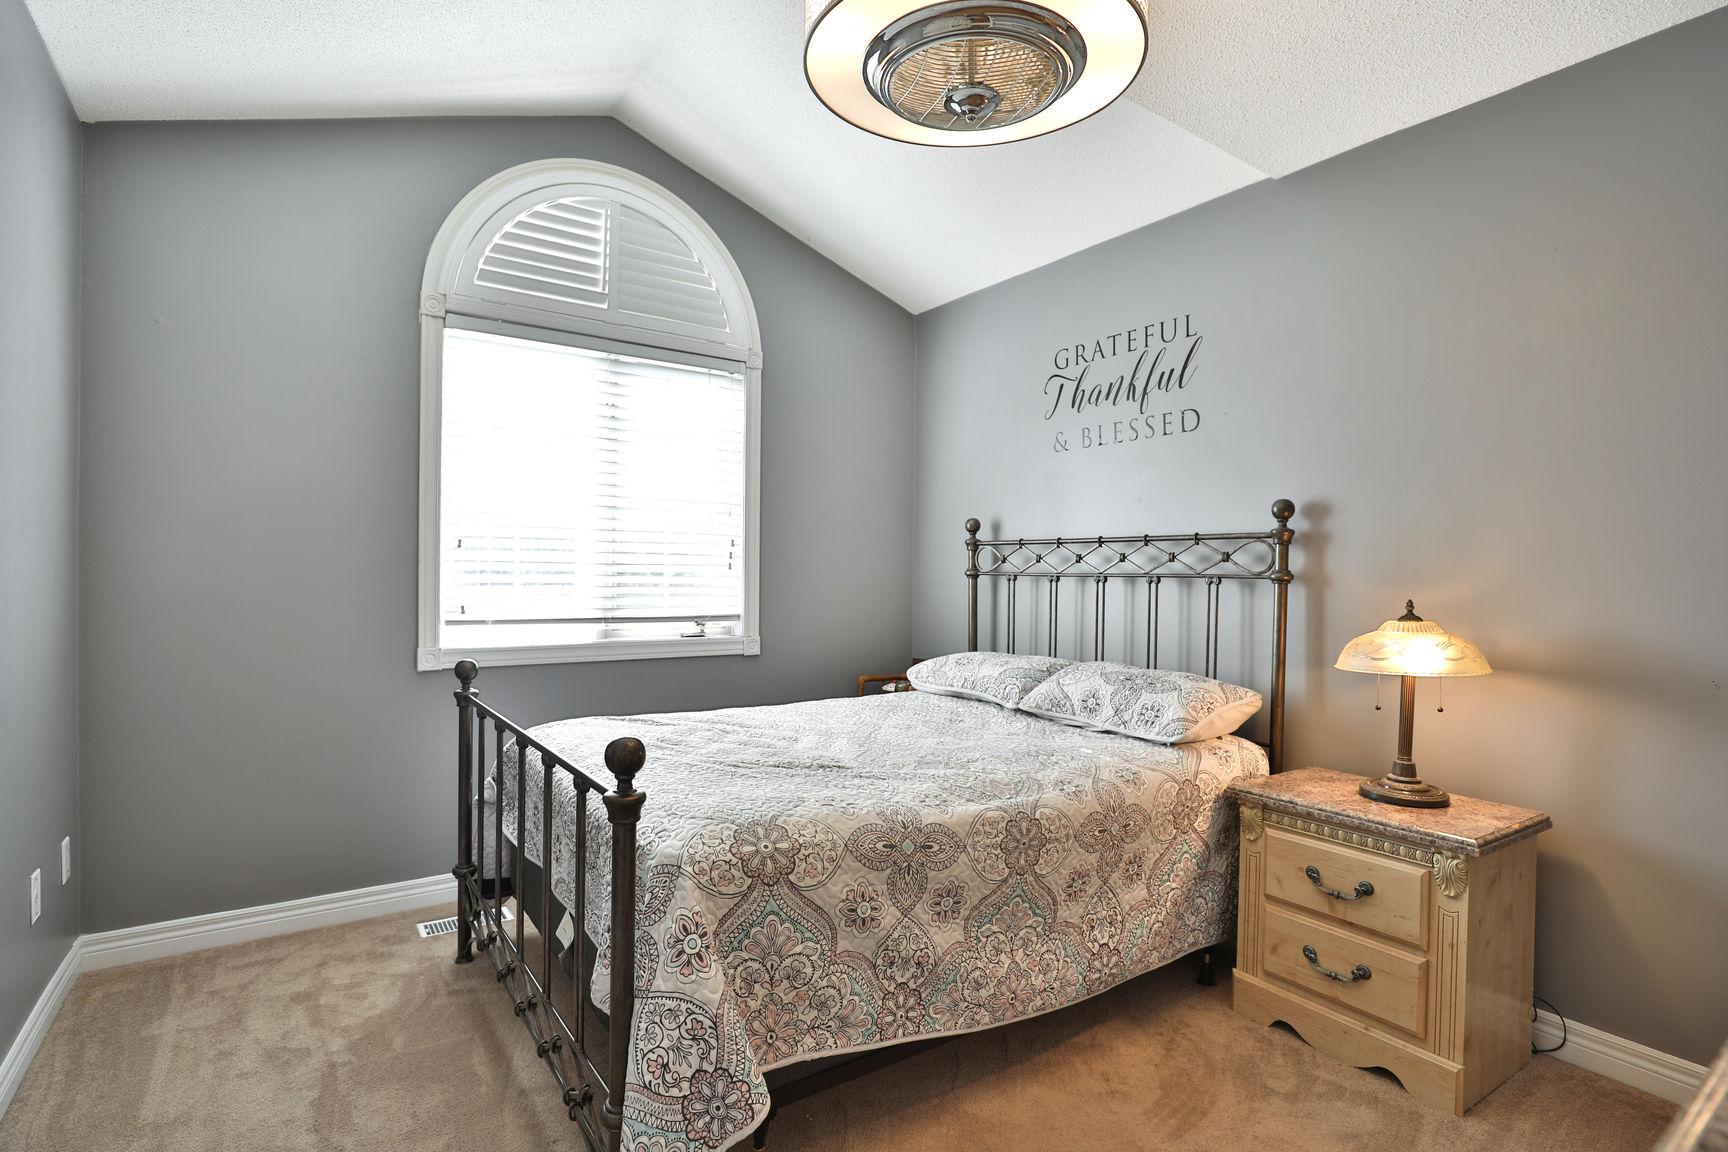 Glanbrook Binbrook 26 Switzer bedroom 3 3 - Recently SOLD in Binbrook